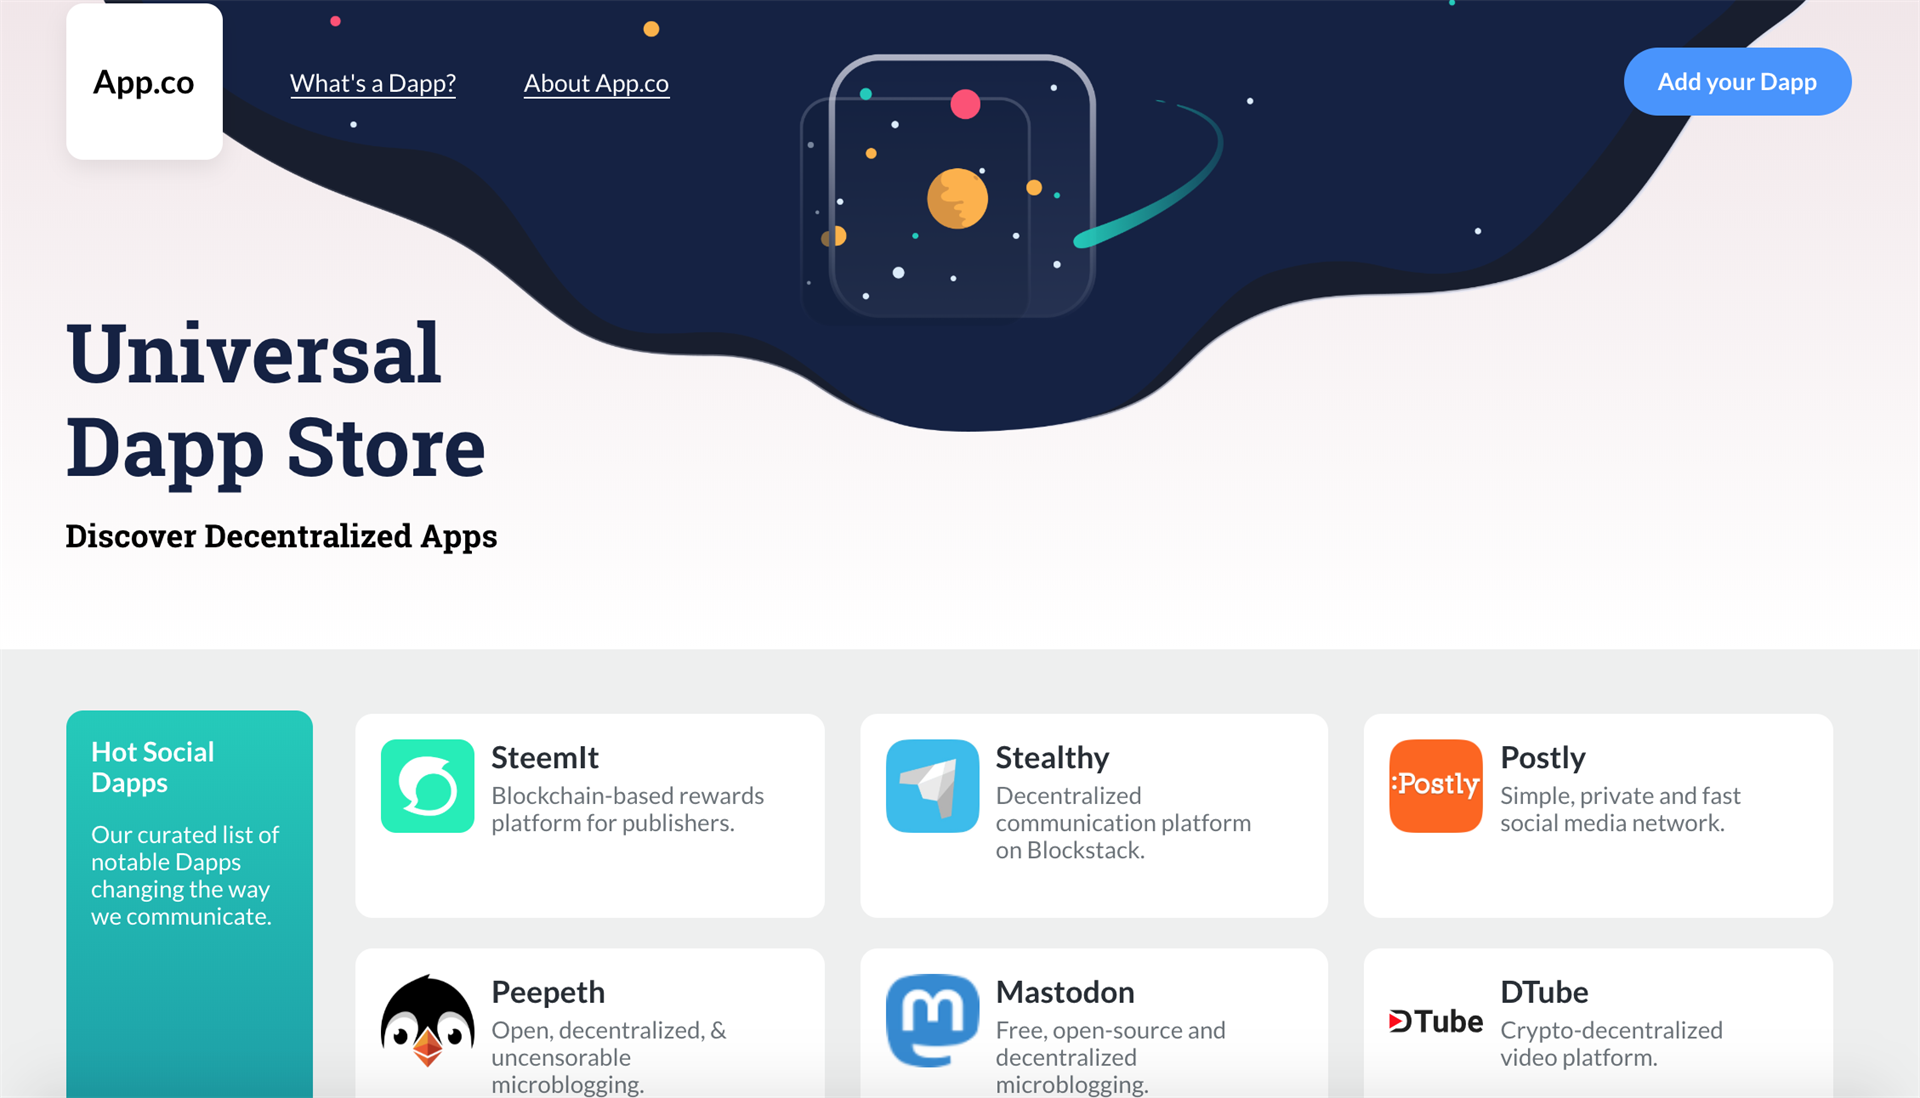 app.co, dapps